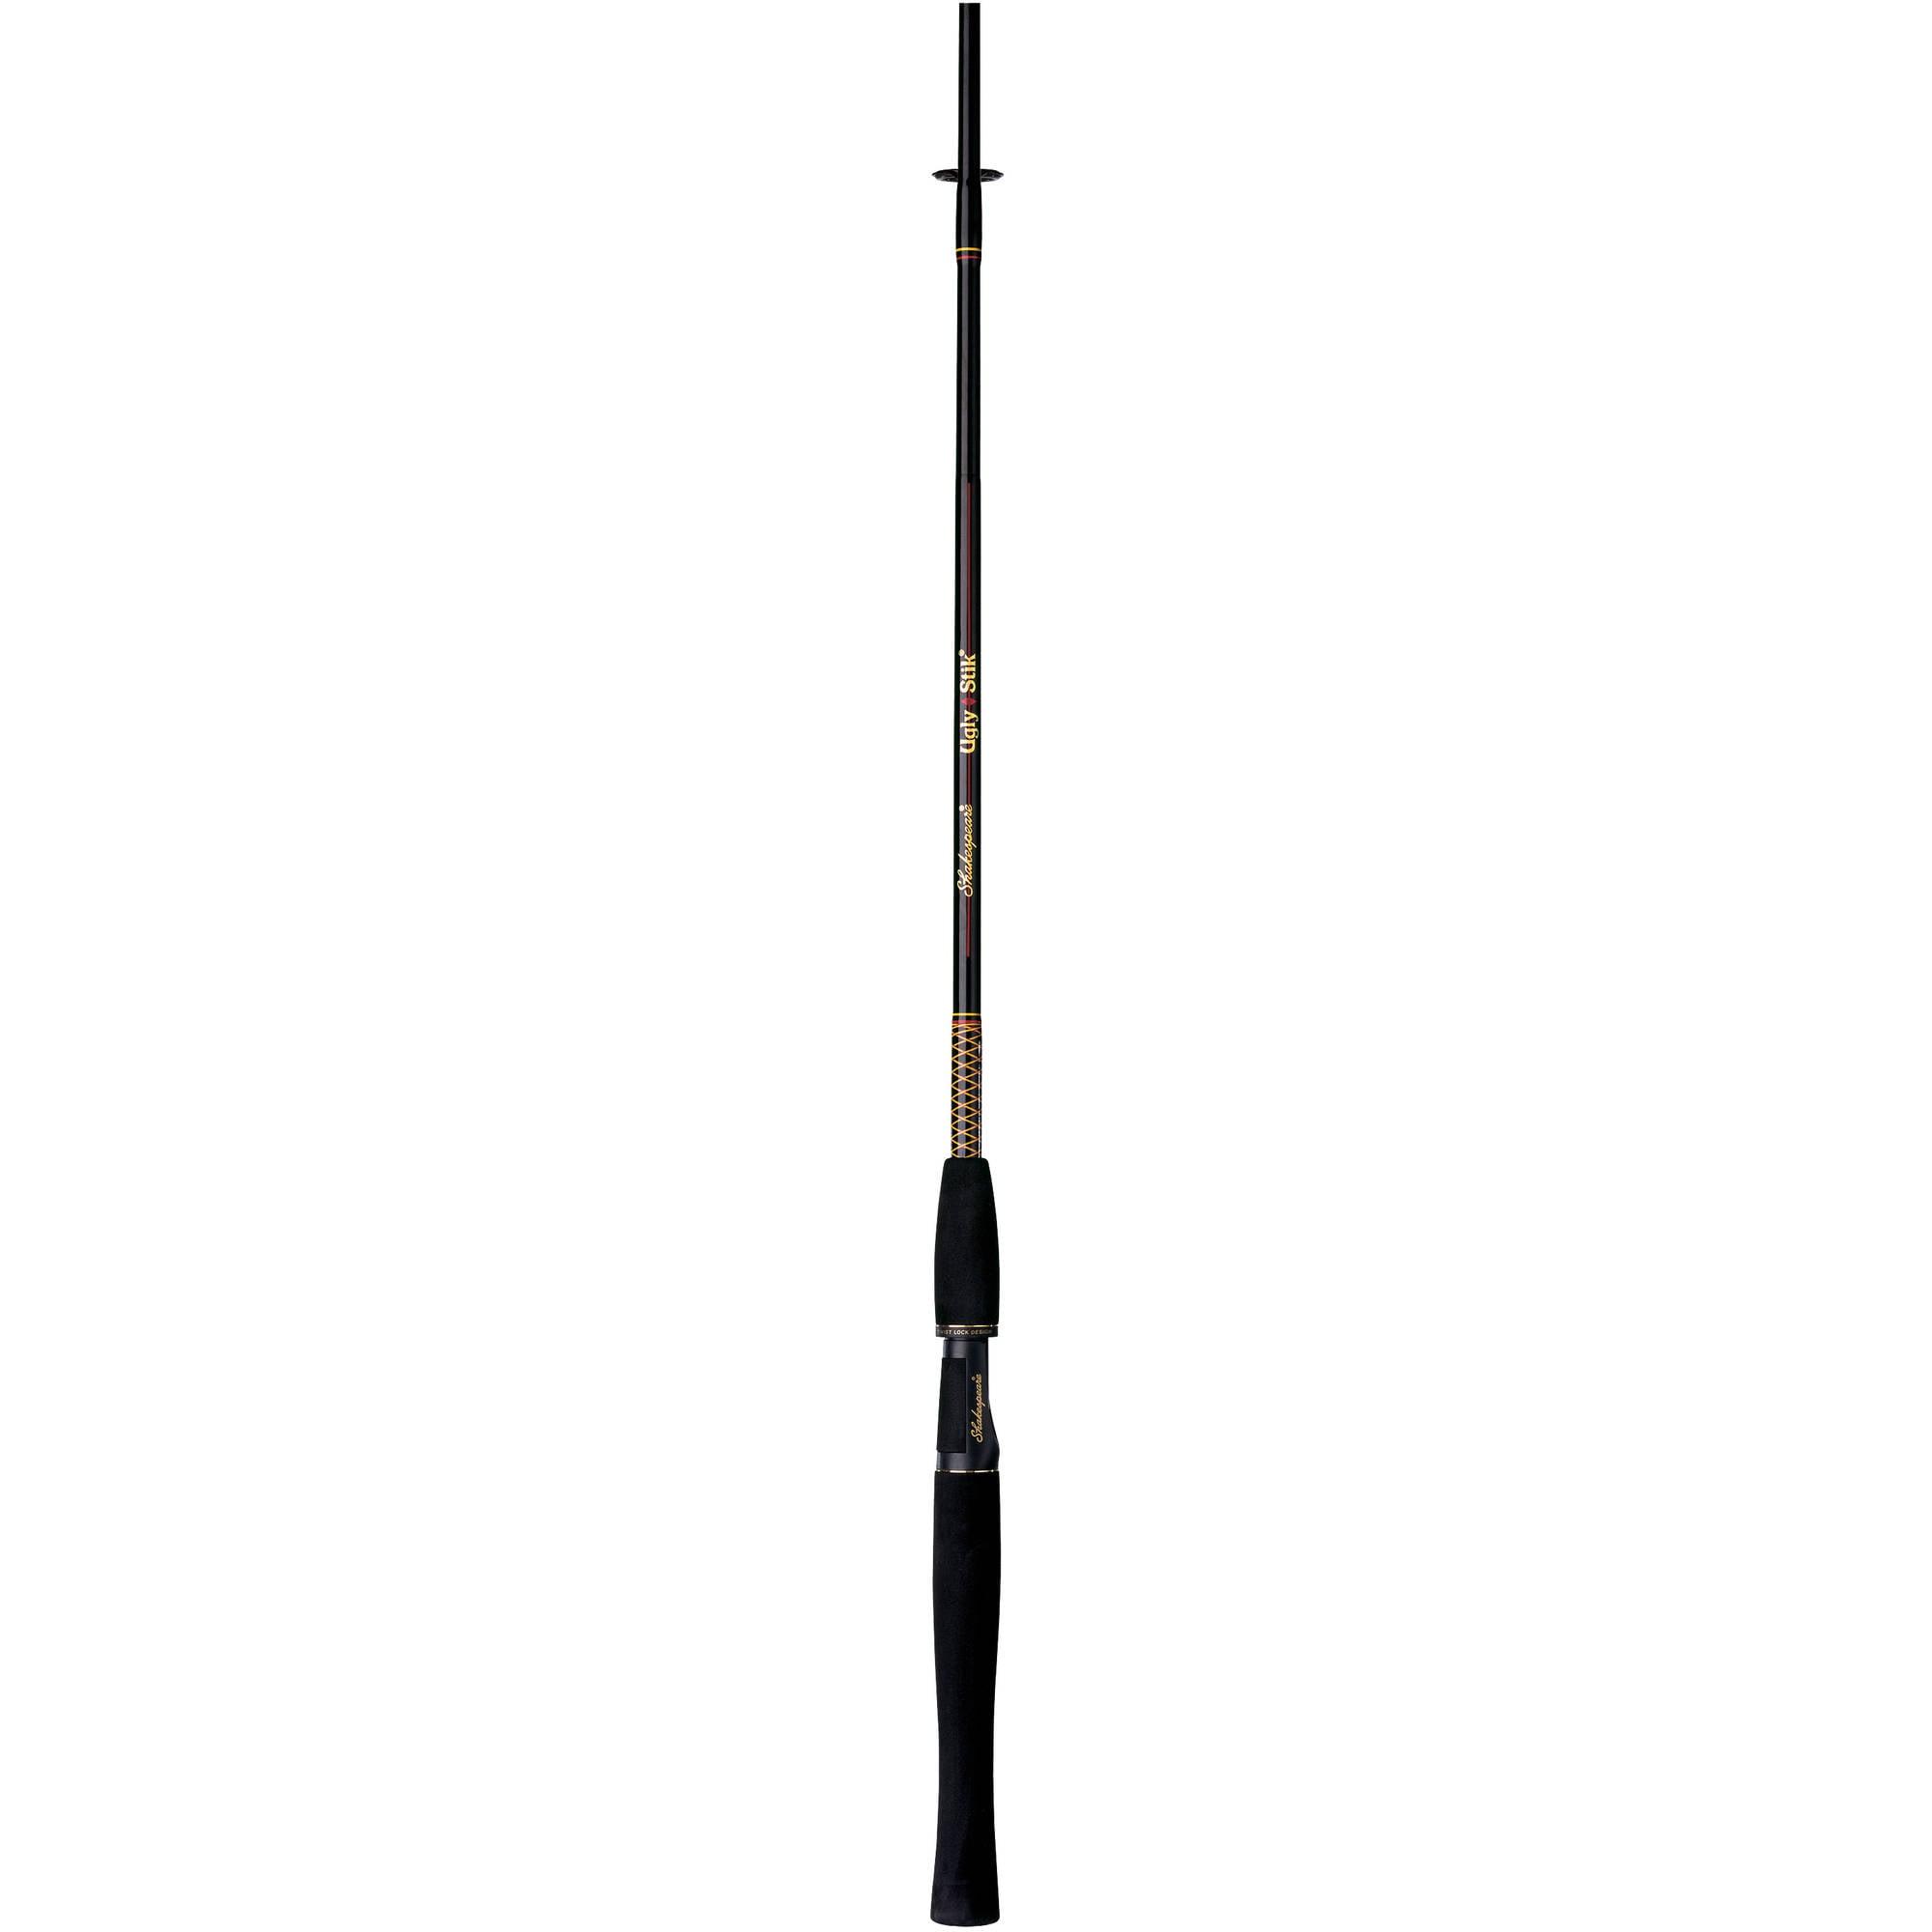 Berkley Fusion Spinning Reel and Fishing Rod Combo by Berkley